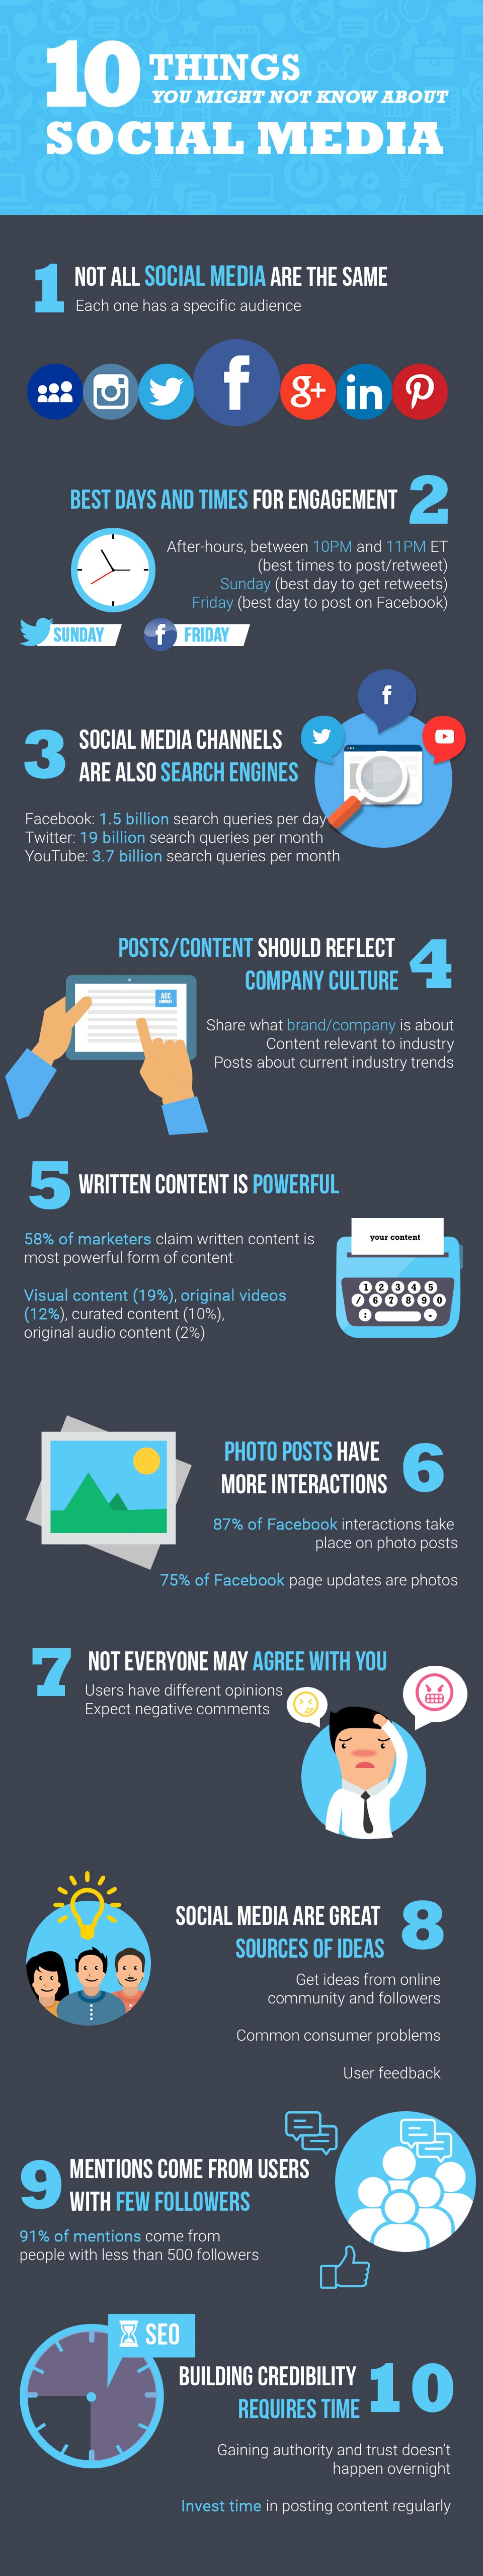 10 saker om sociala medier